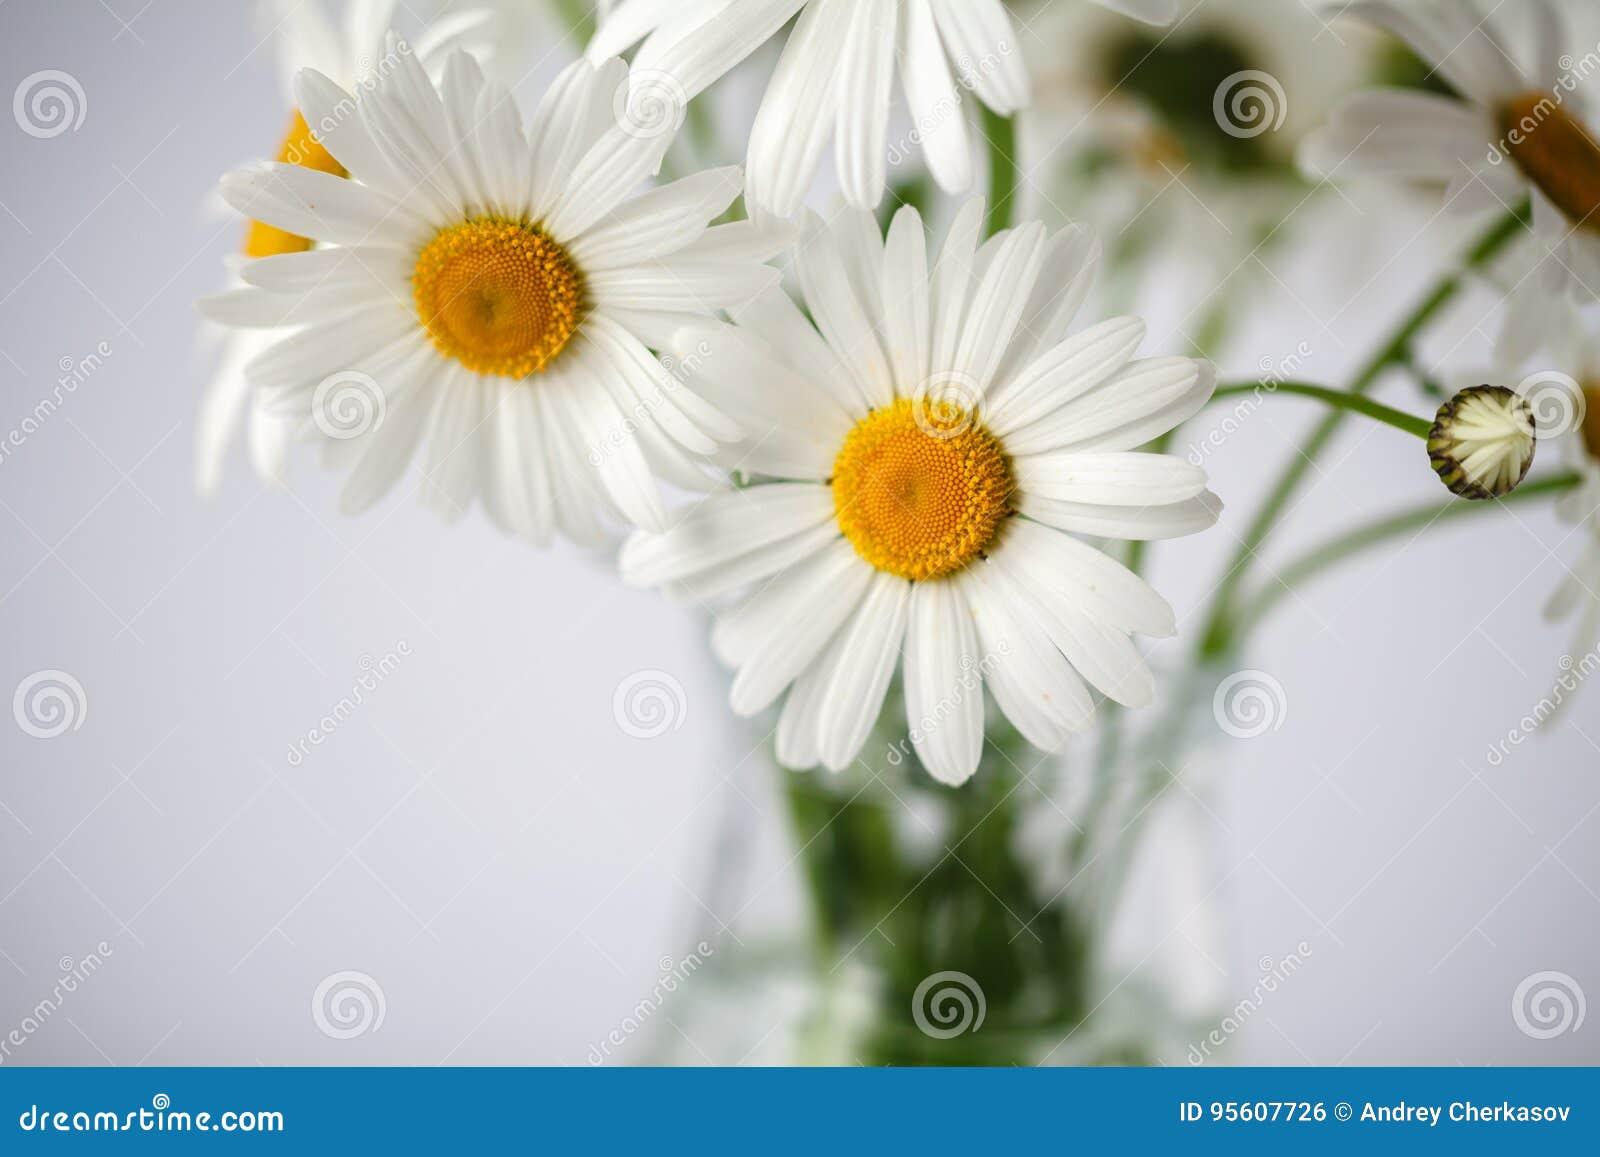 Daisies summer white flower on white background stock photo image daisies summer white flower on white background mightylinksfo